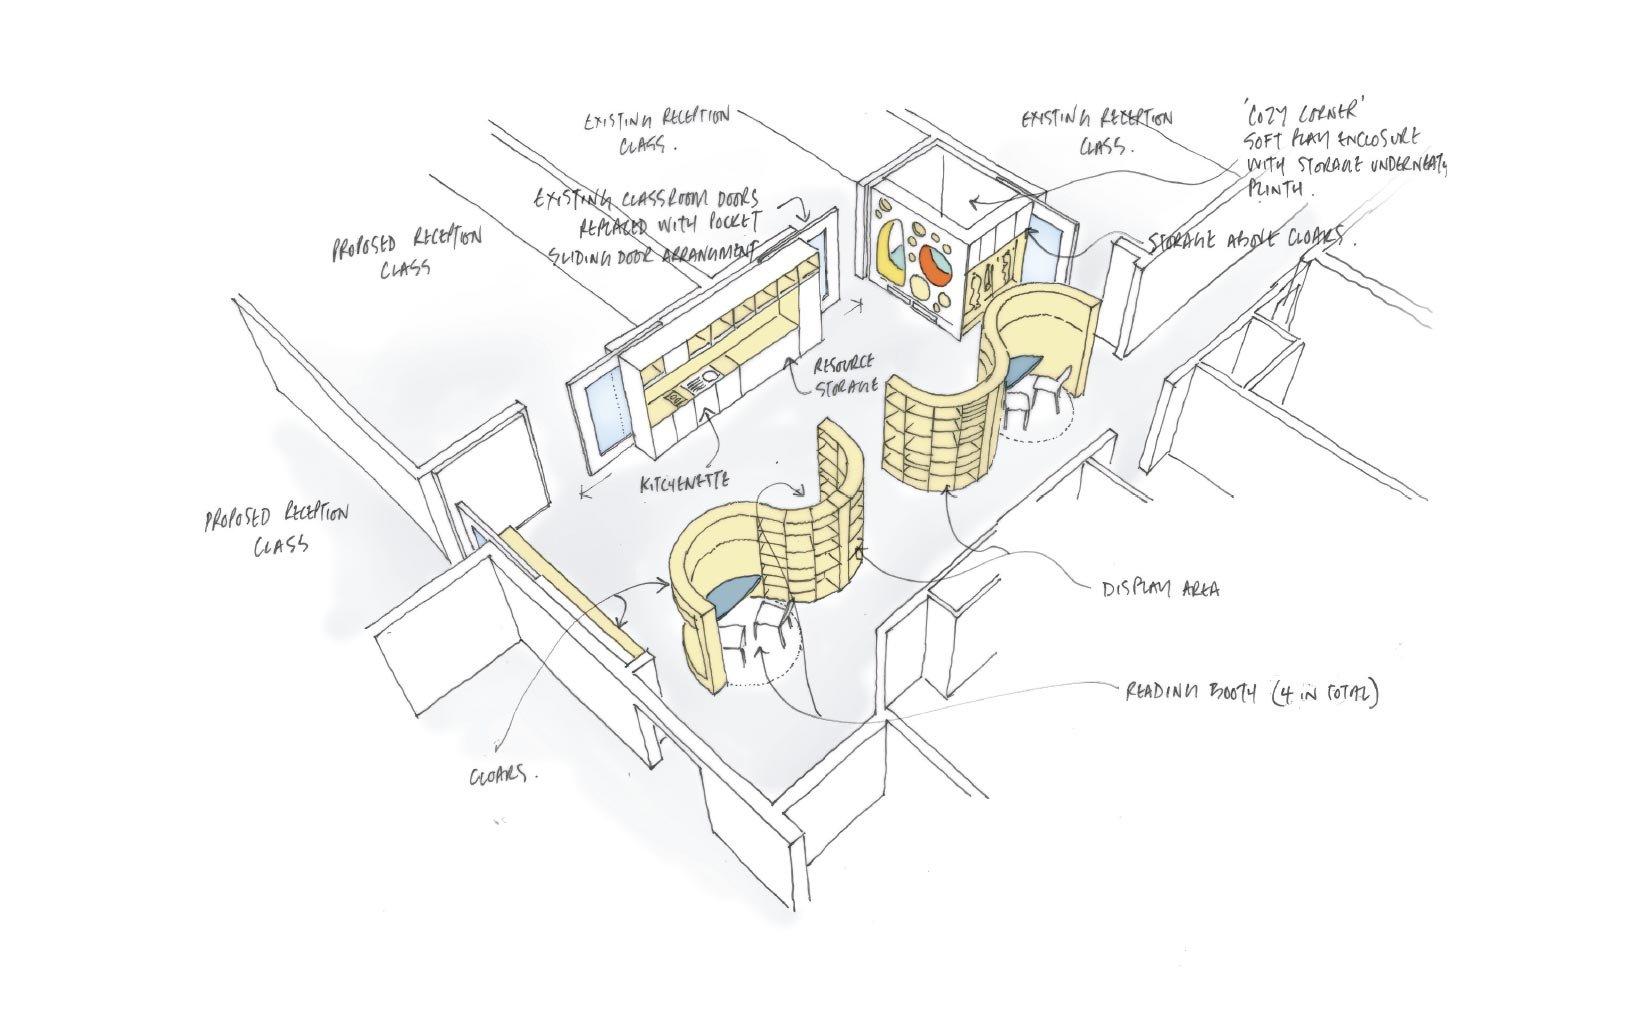 Orleans School, Twickenham, London, Furniture Design Sketch